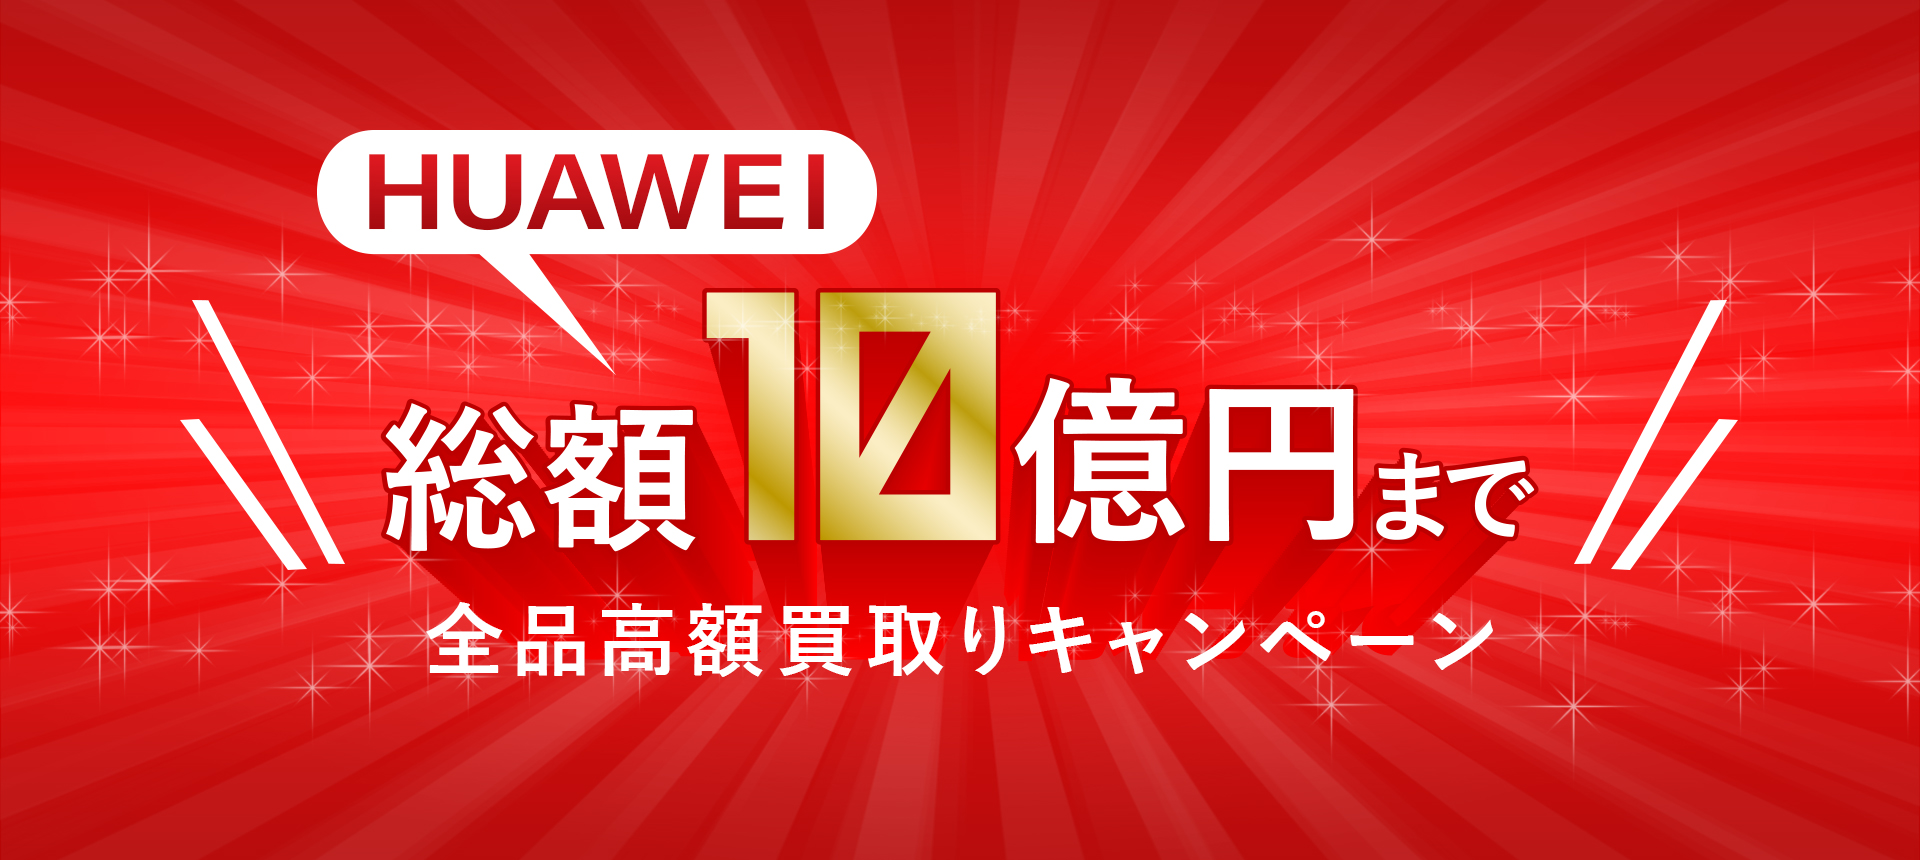 HUAWEI(ファーウェイ)総額10億円まで 全品高額買取キャンペーン